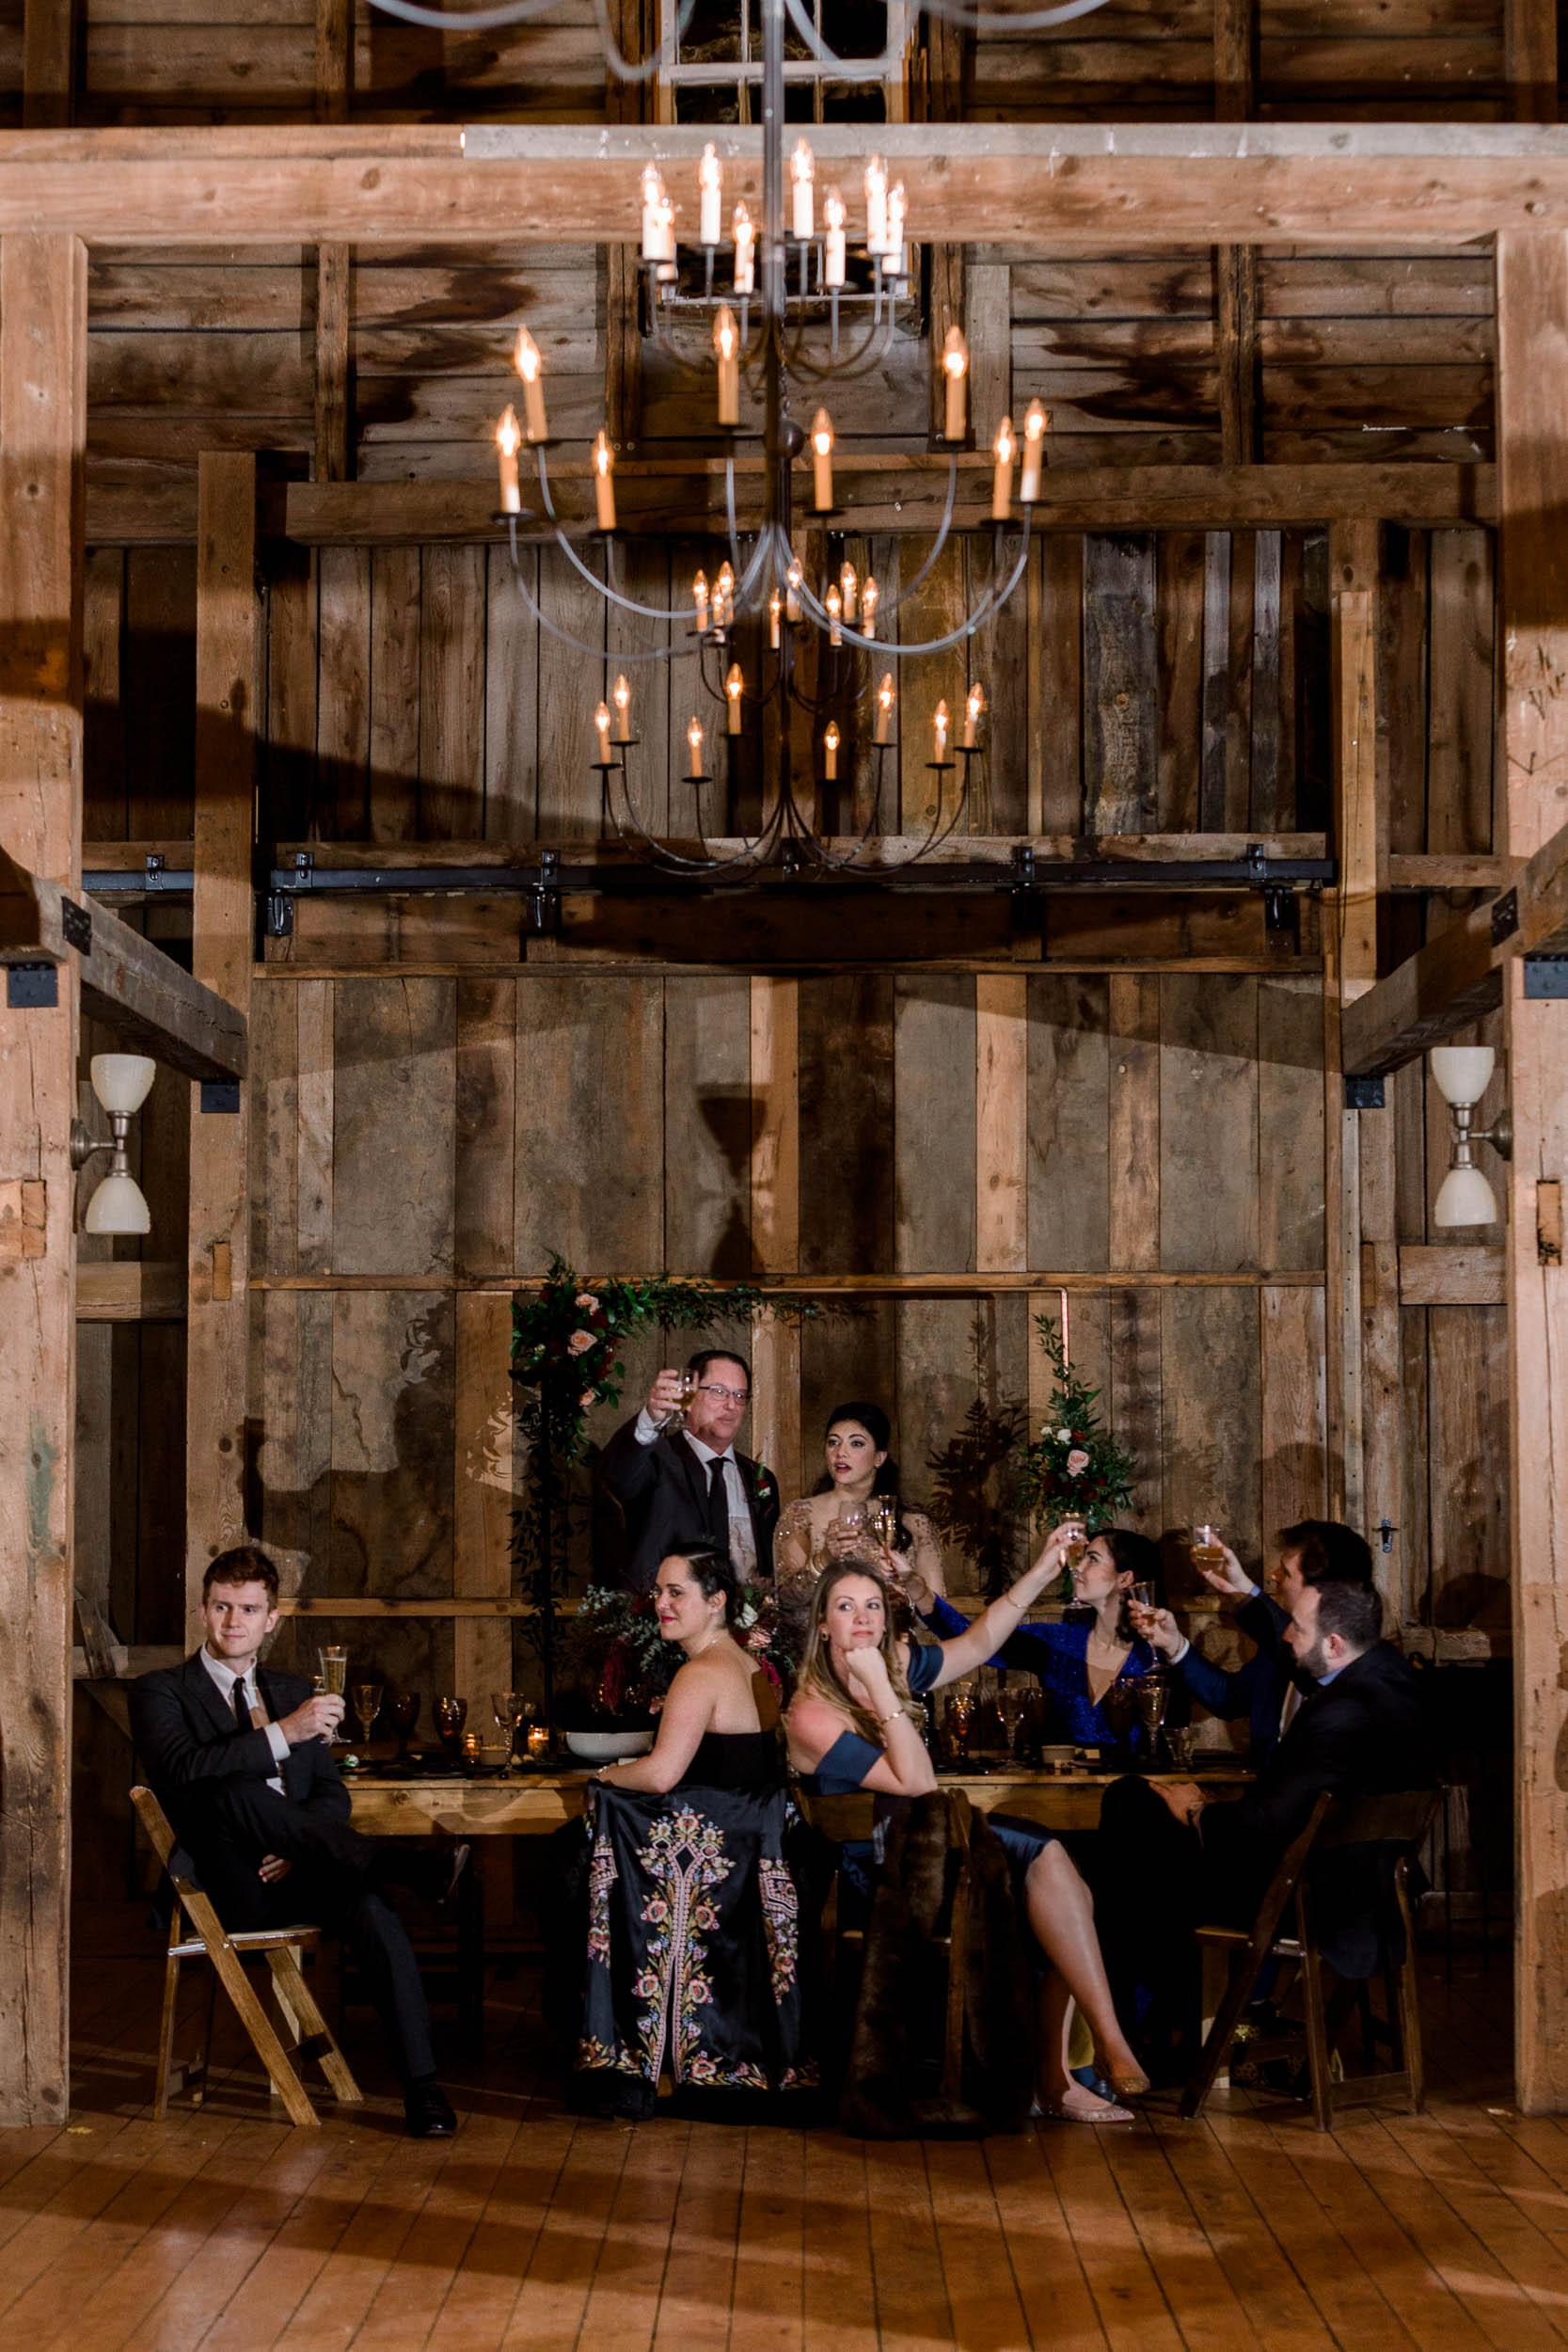 J+J_Barn at Walnut Hill_Portland Maine Wedding_Buena Lane Photography_112718_SJ_204-Edit.jpg